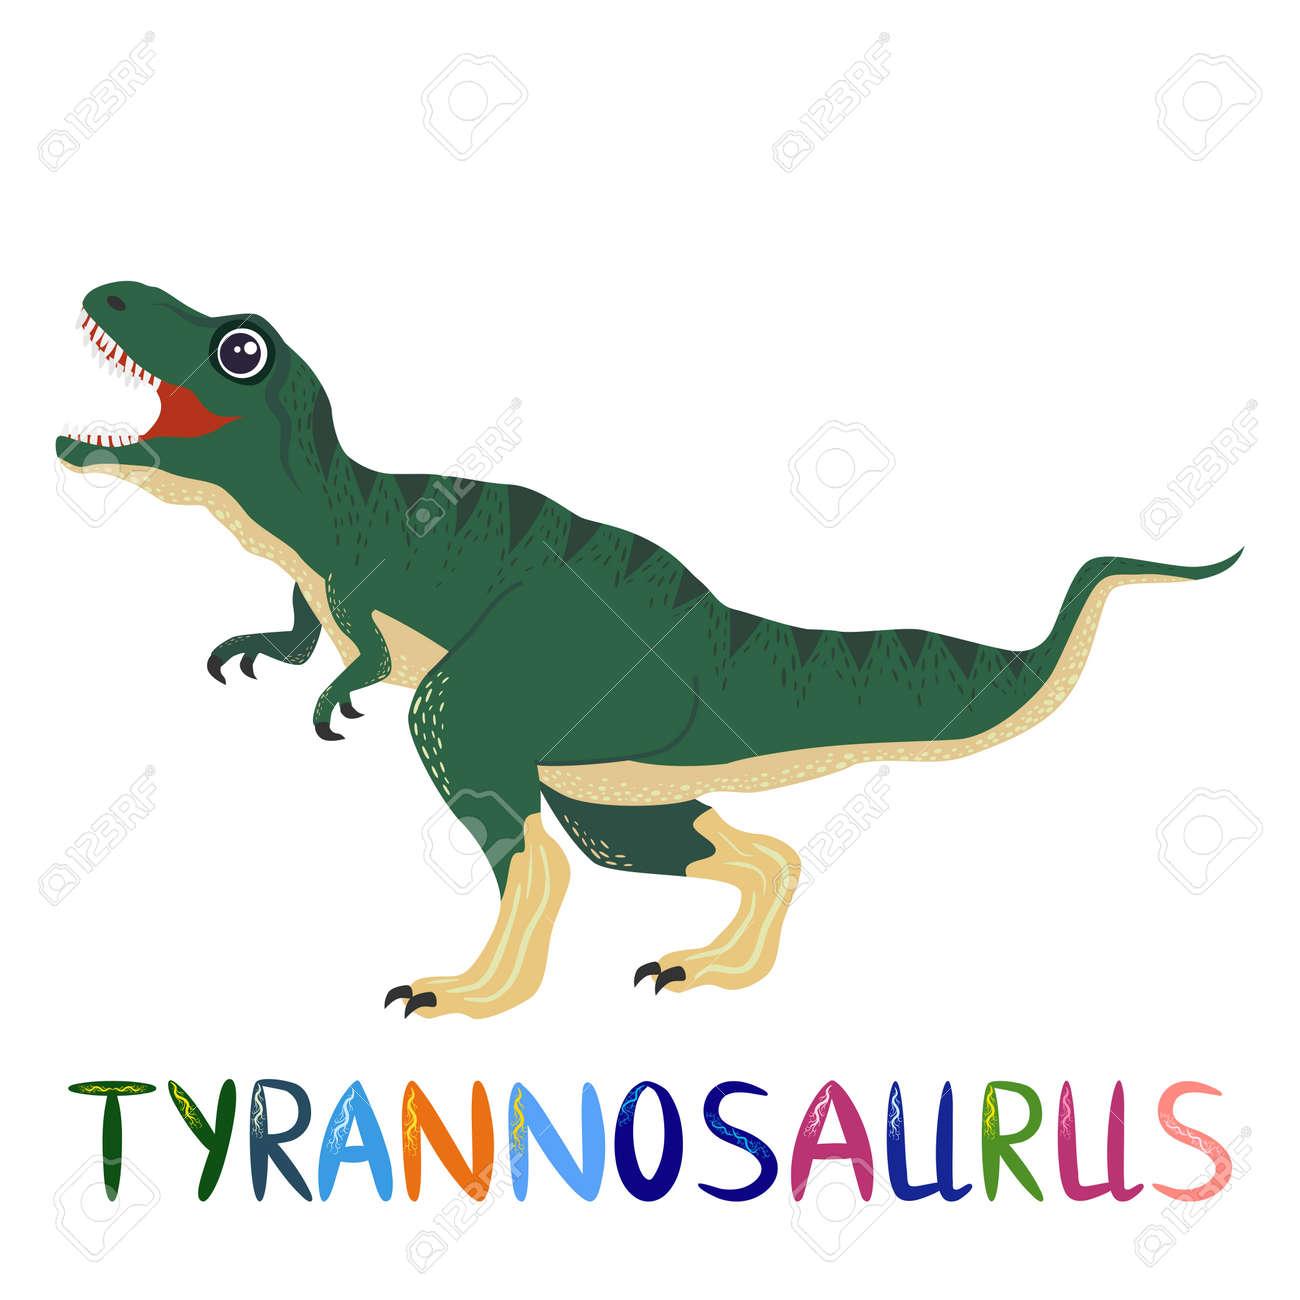 Tyrannosaurus green, prehistoric dinosaurs collection. Ancient animals. Hand drawn. - 170550040